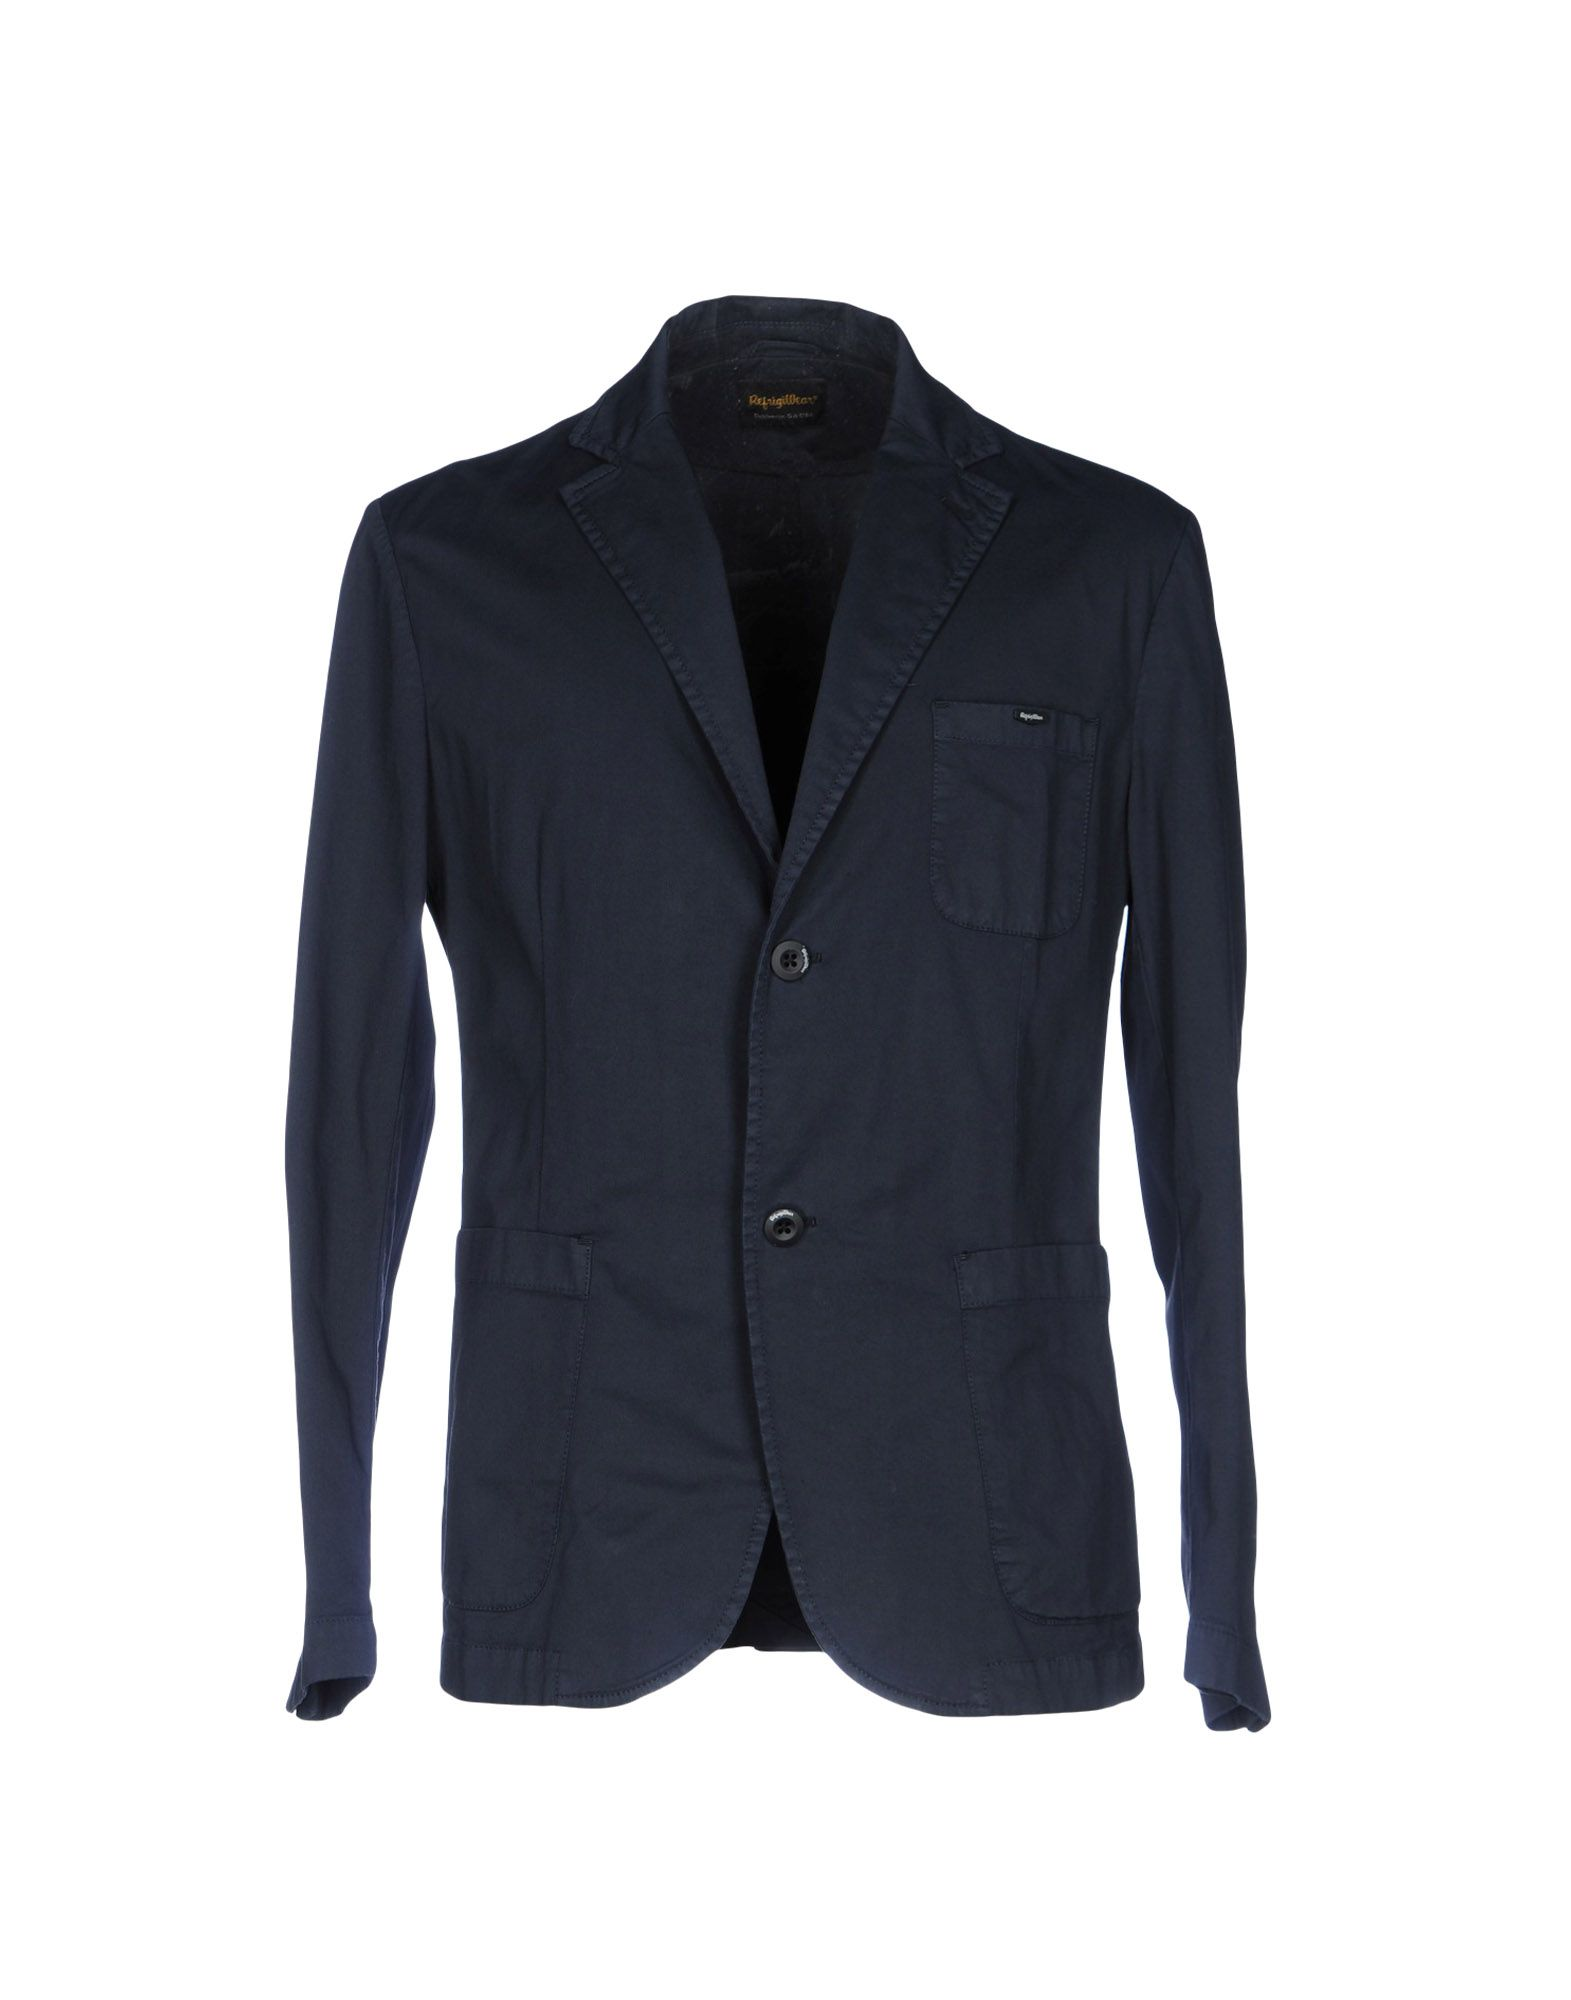 Giacca Refrigiwear Uomo - Acquista online su